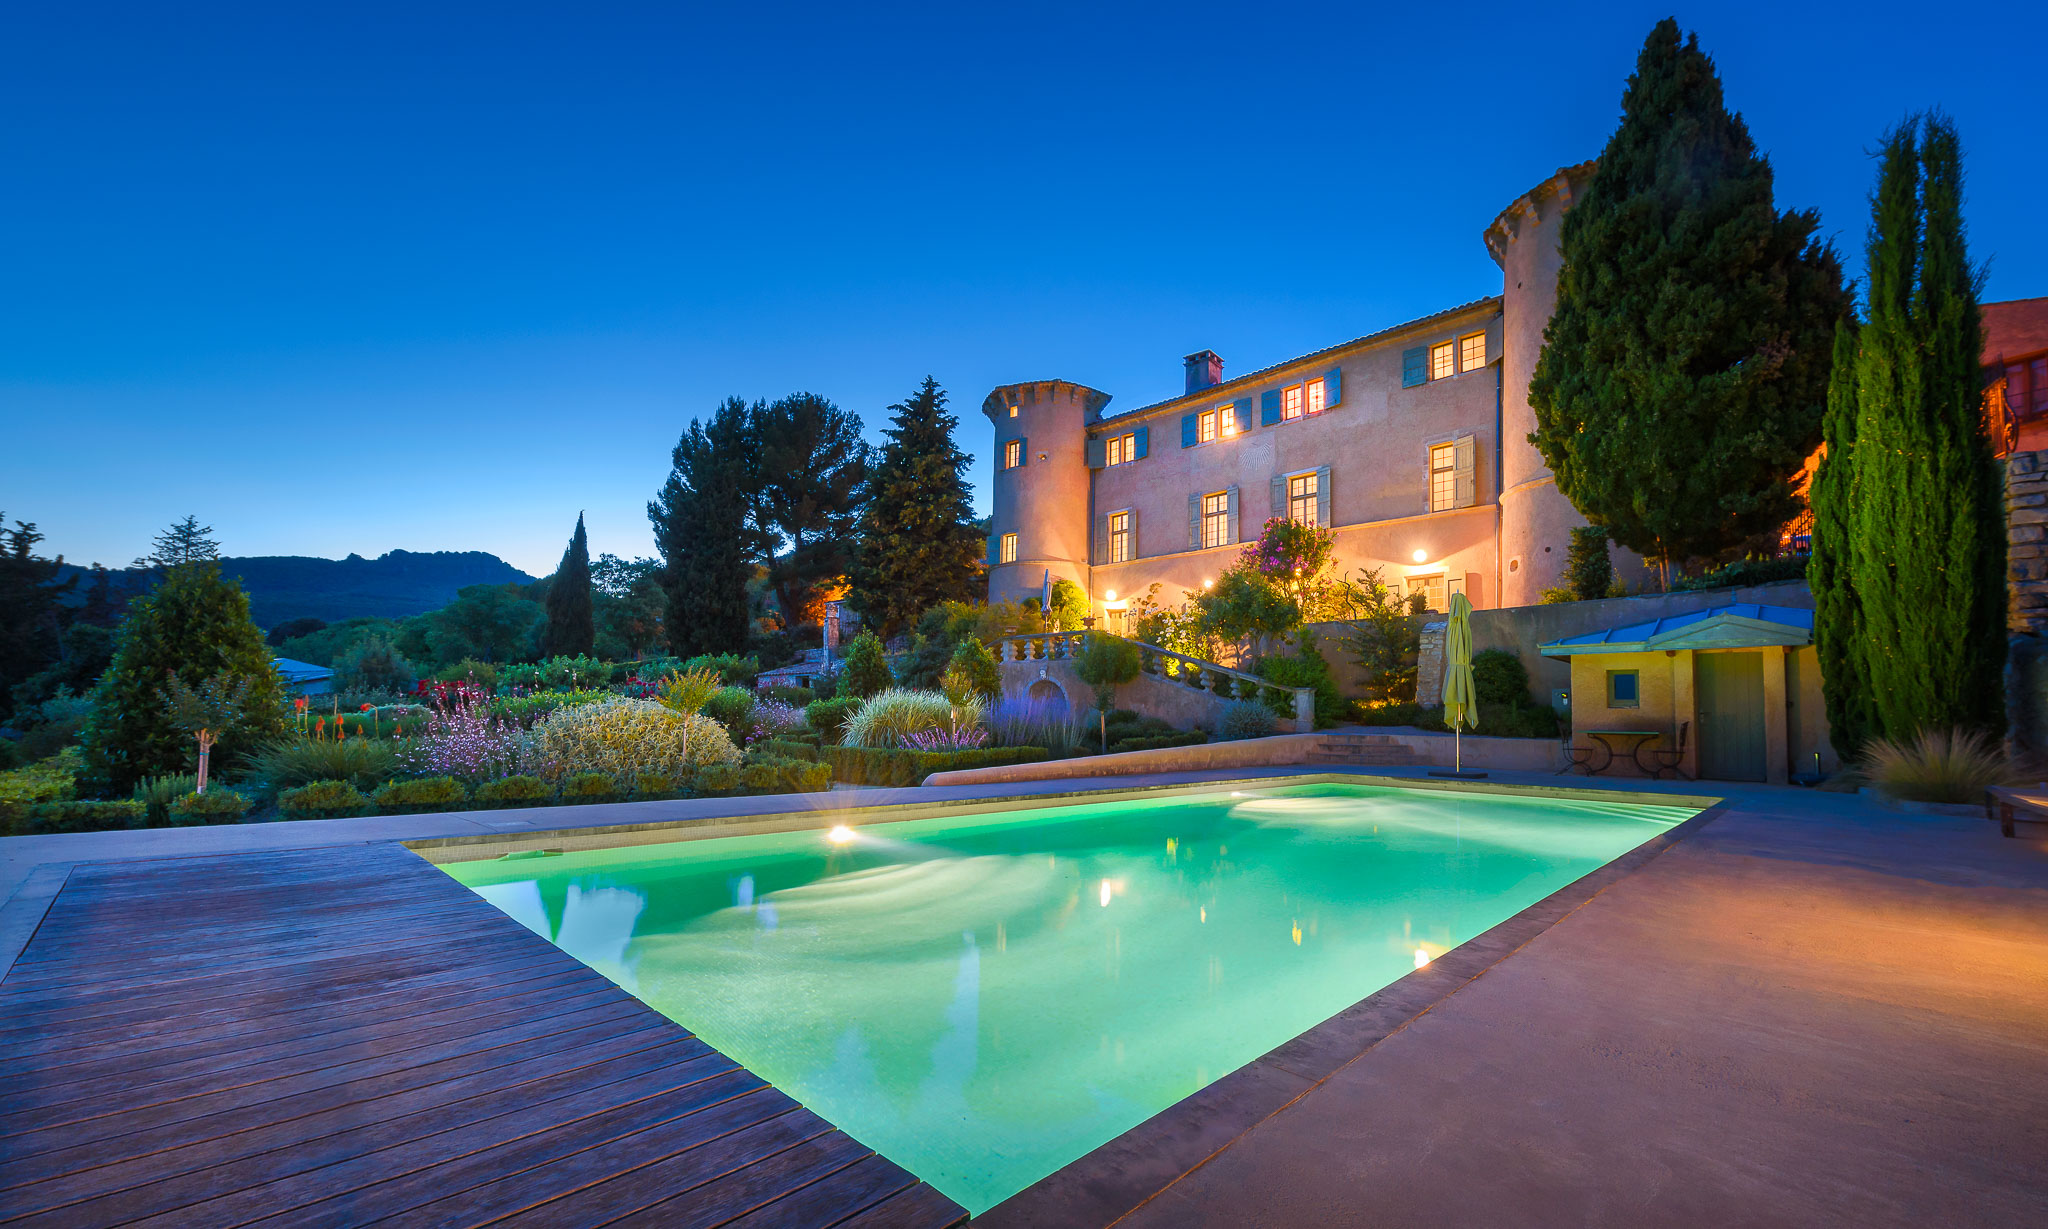 Chateau arboras nocturne 14-06-1.jpg